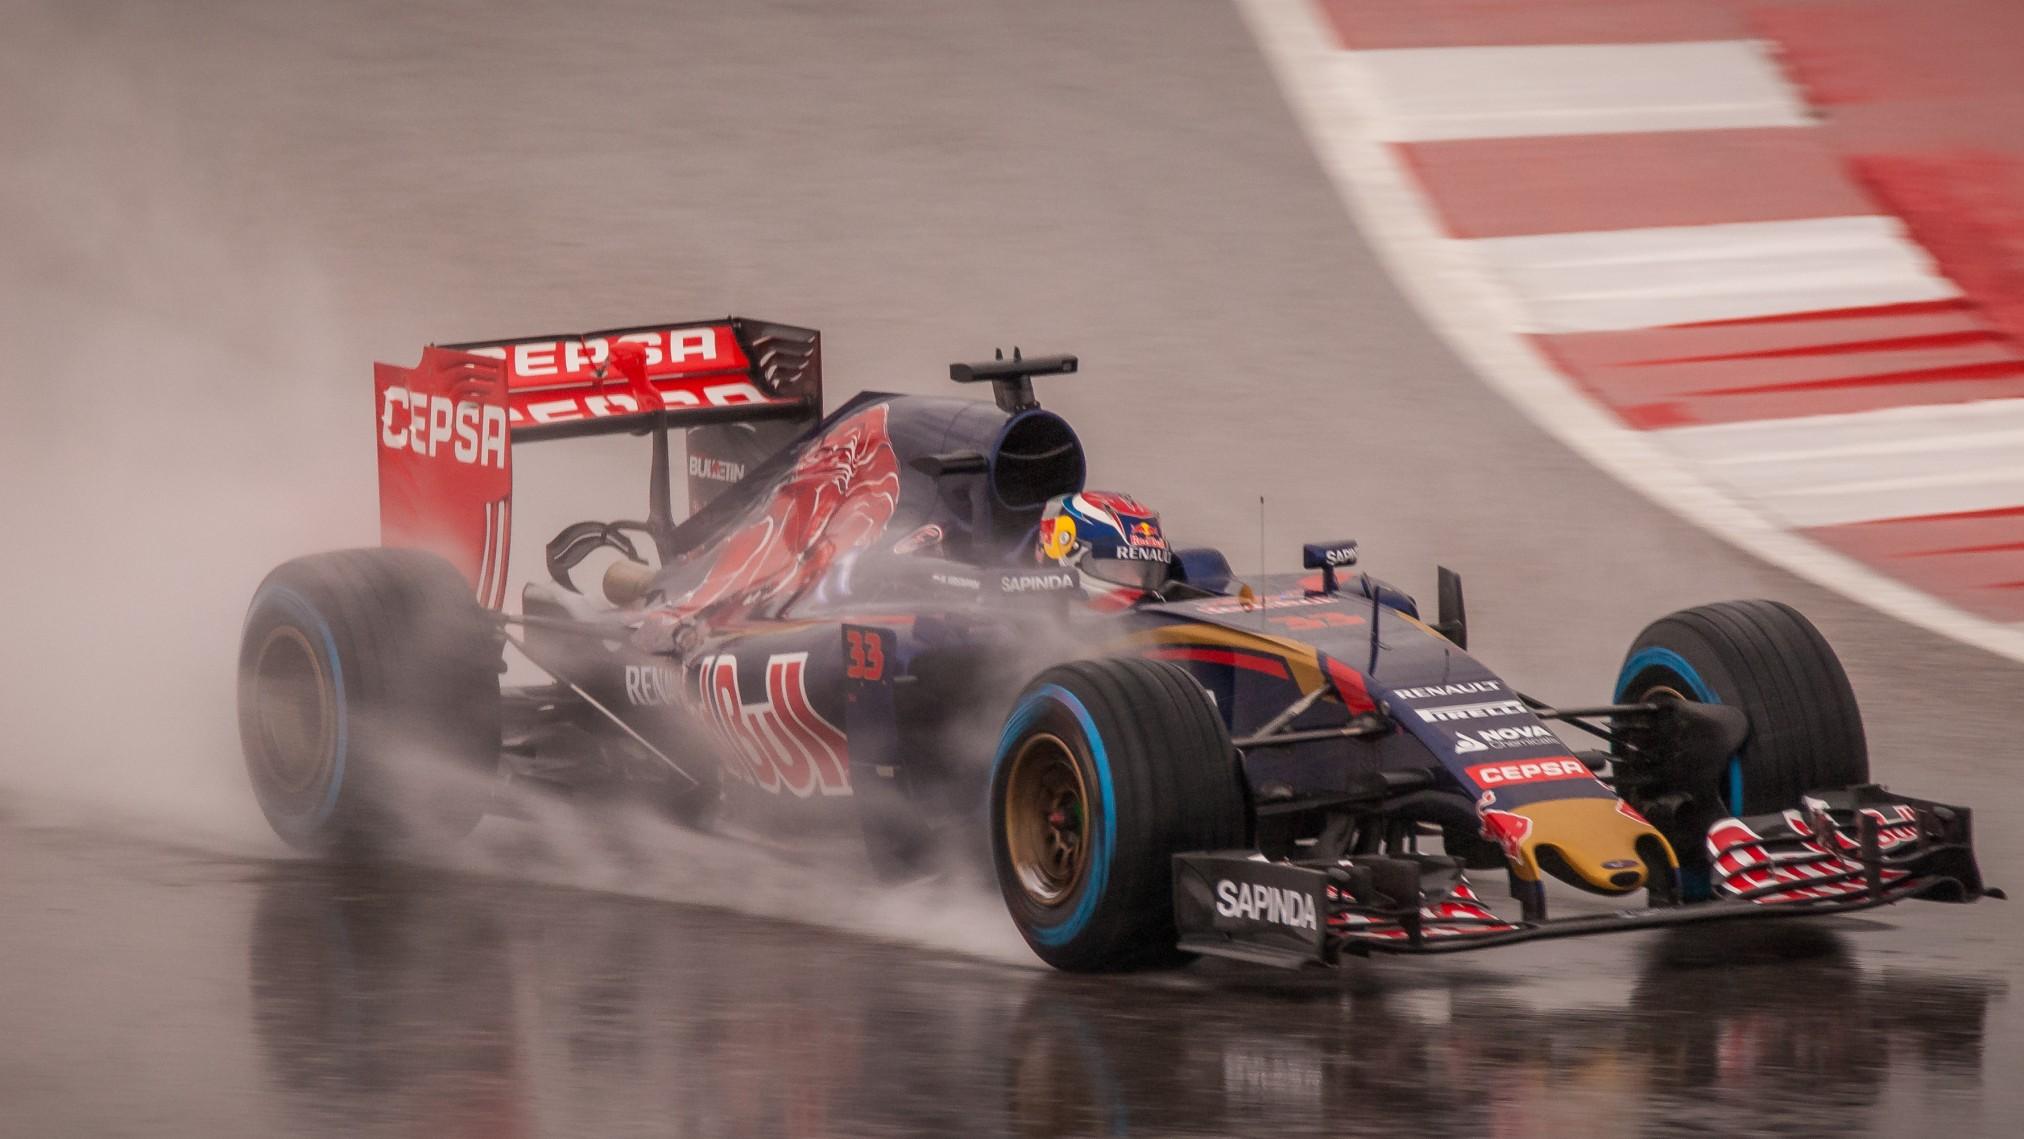 Max Verstappen showing he can race in wet conditions. Photograph: Joe McGowan